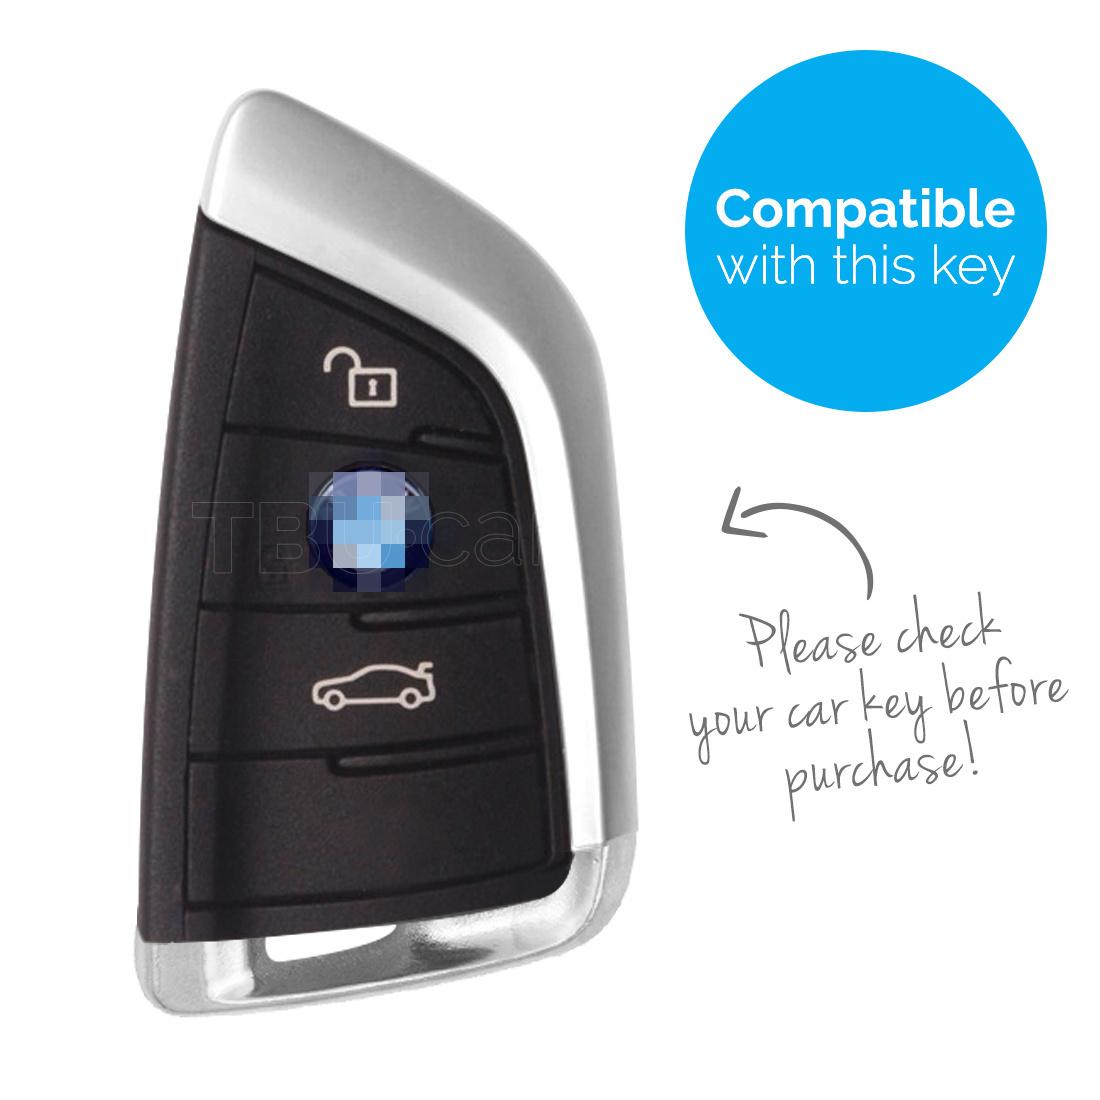 TBU car TBU car Sleutel cover compatibel met BMW - TPU sleutel hoesje / beschermhoesje autosleutel - Roségoud